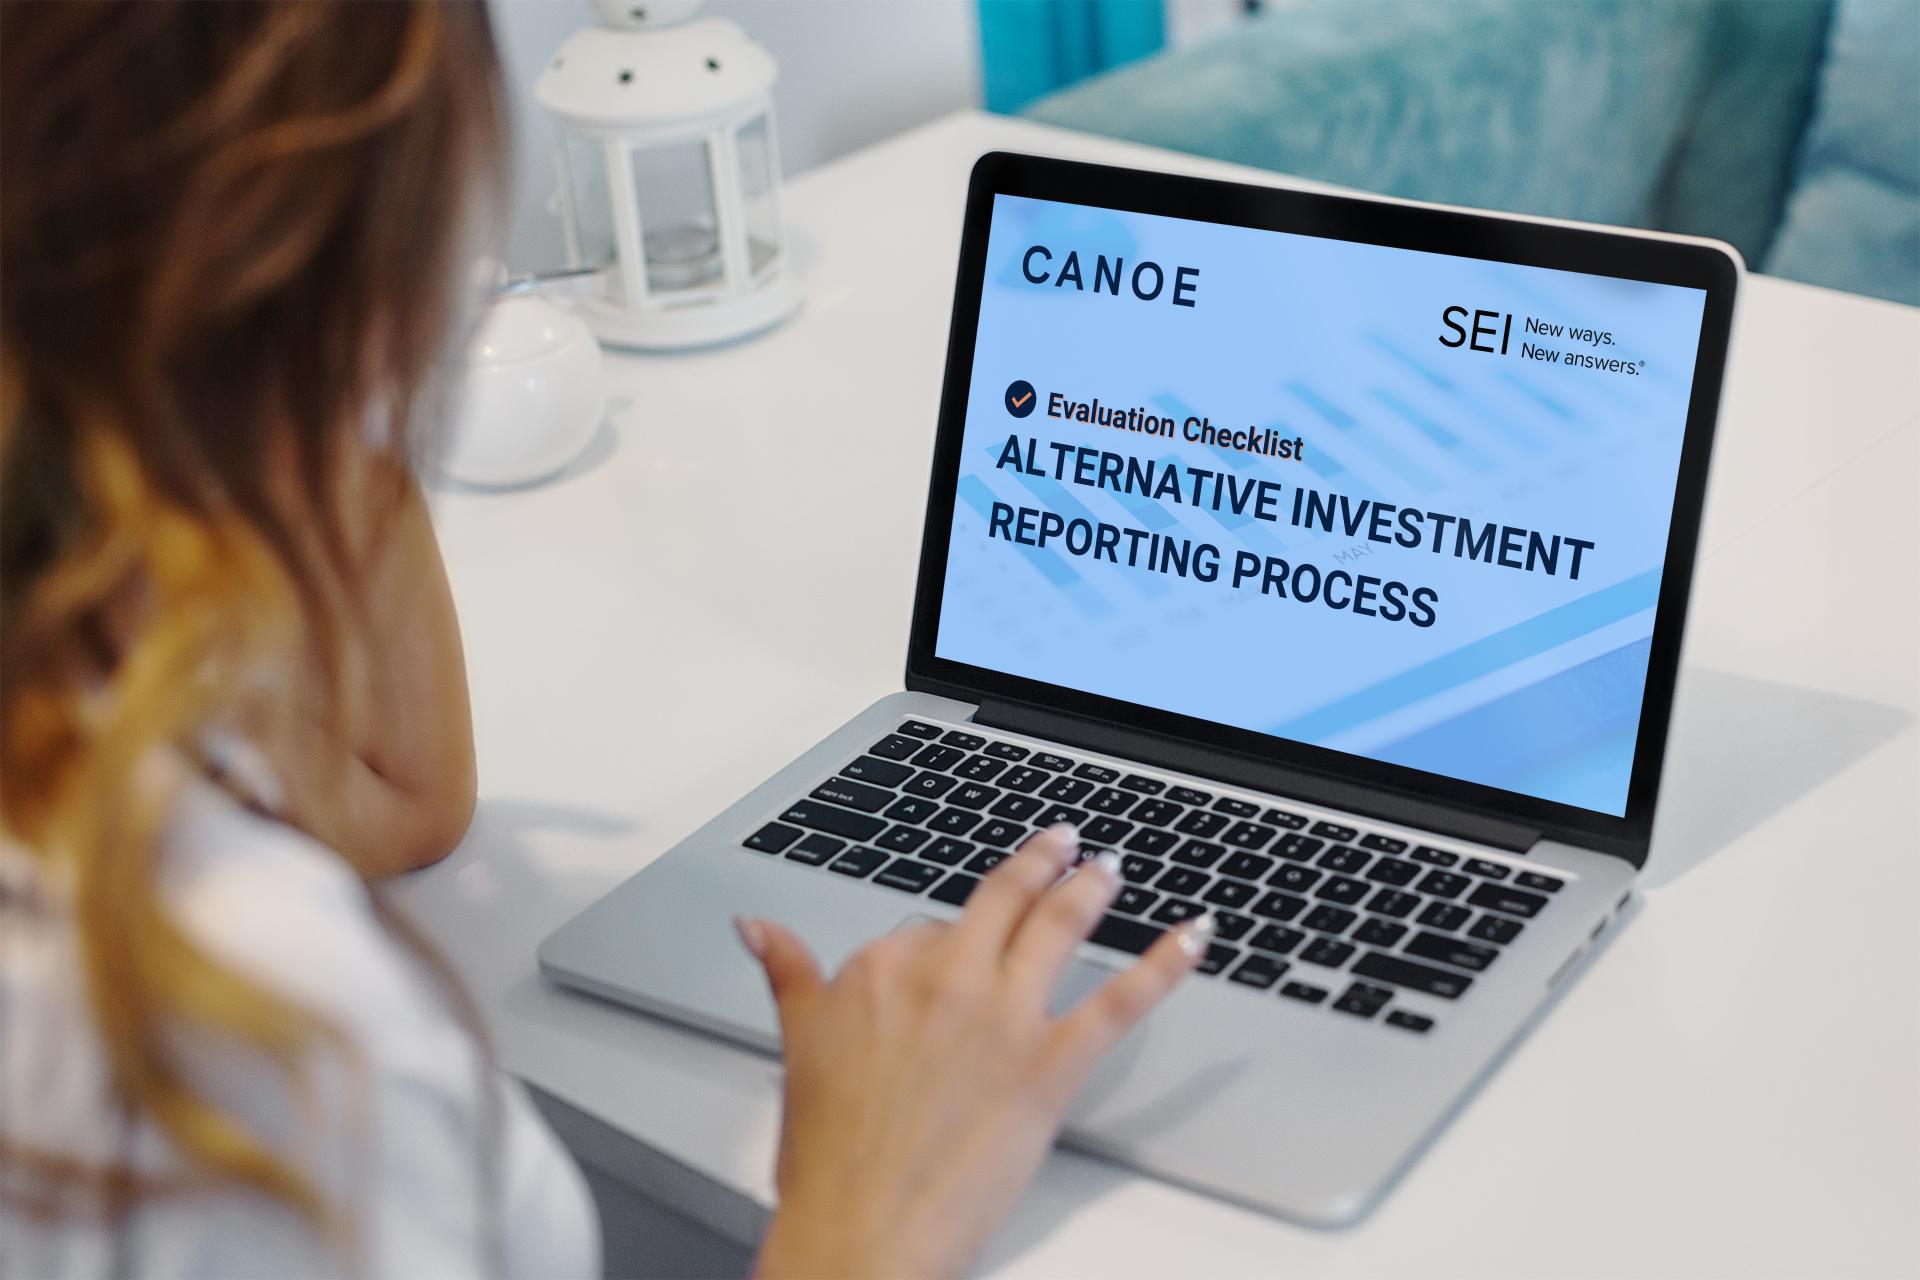 SEI and Canoe Alternative Investment Reporting Process Checklist Image